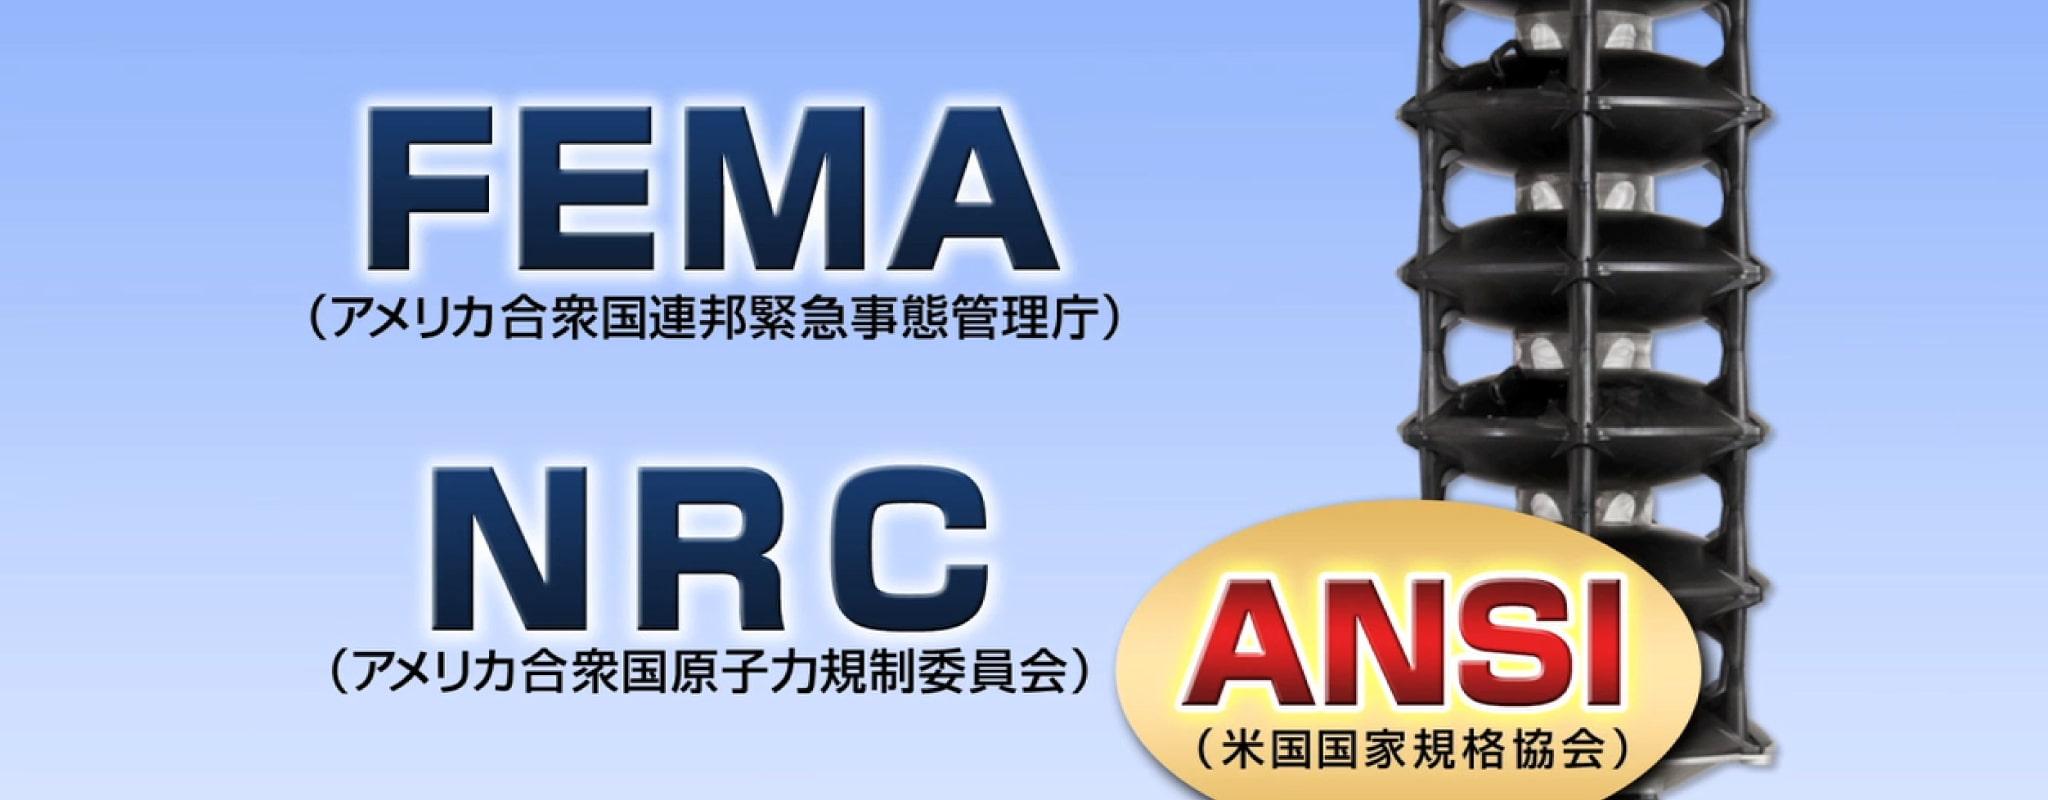 FEMA(アメリカ合衆国連邦緊急事態管理庁) NRC(アメリカ合衆国原子力規制委員会) ANSI(米国国家規格協会)